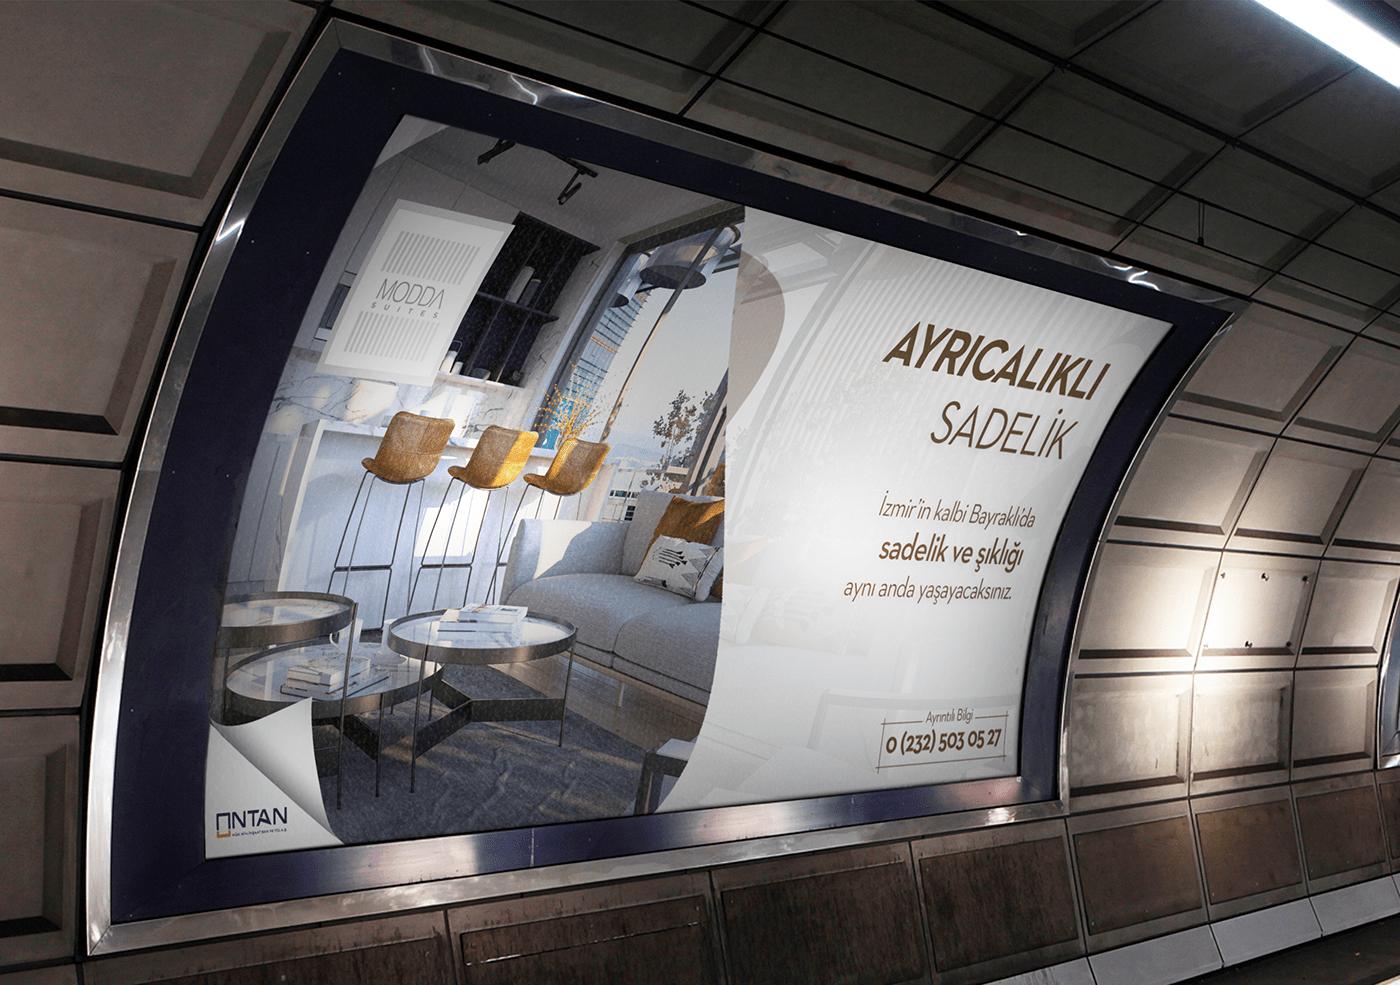 ad advertisement billboard branding